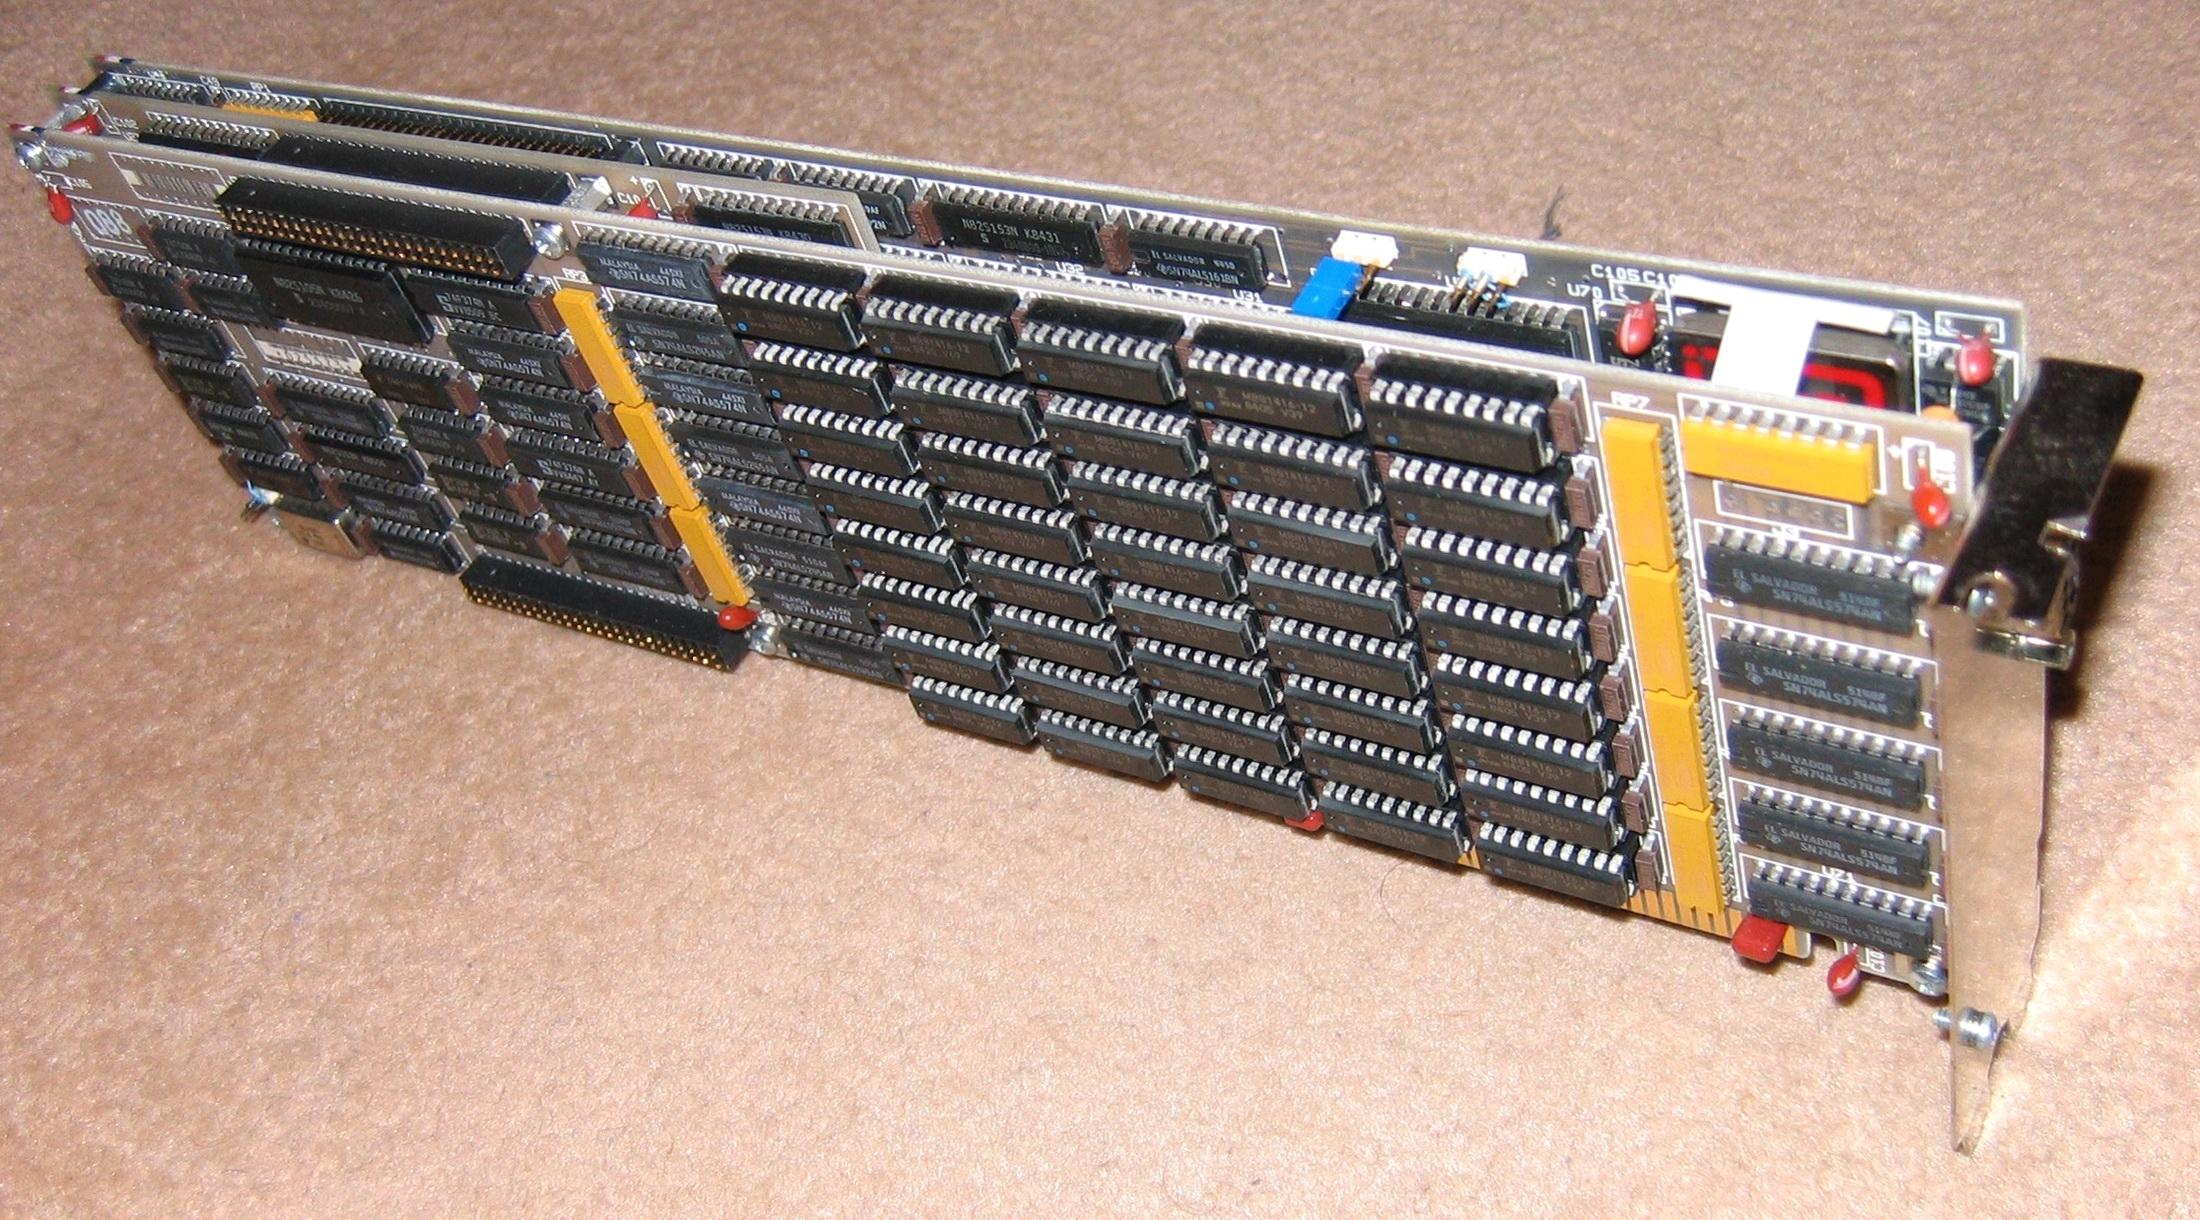 Professional Graphics Controller - Wikipedia